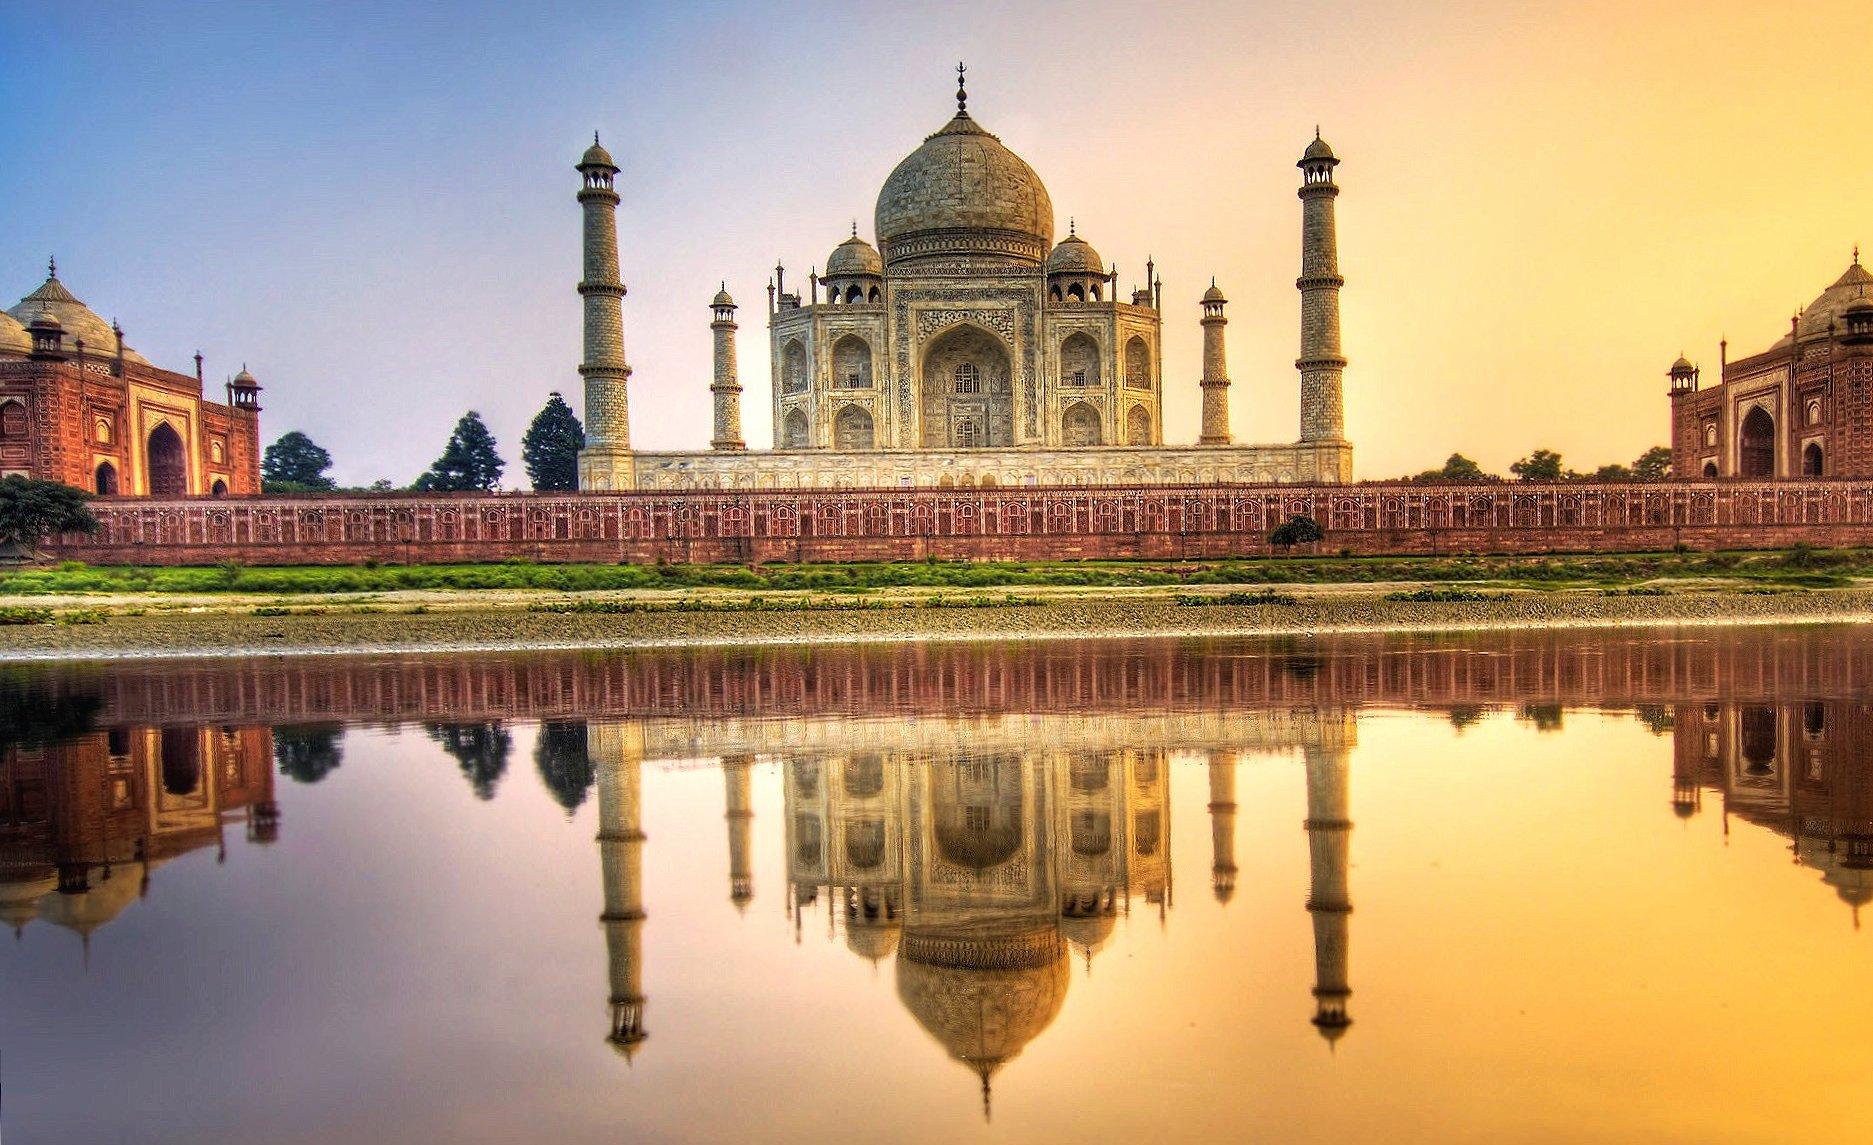 Agra india taj mahal wallpapers HD quality